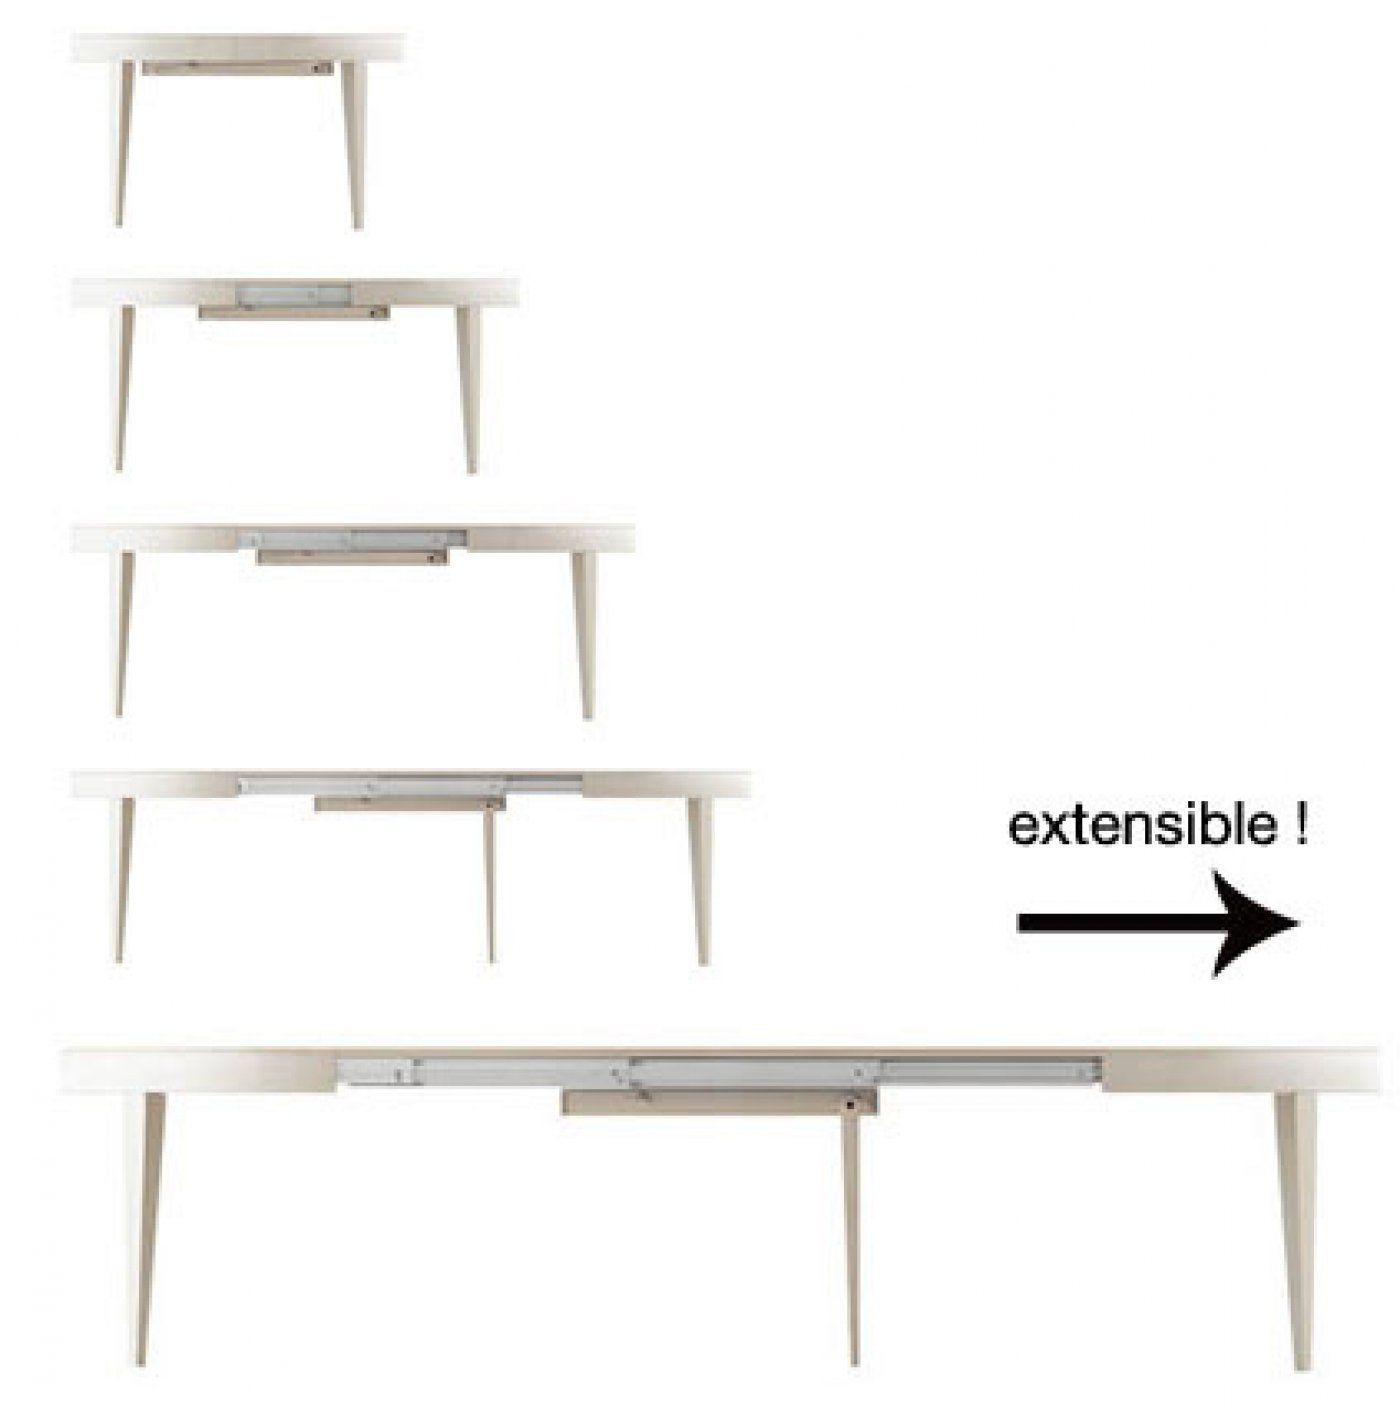 Table Ronde Extensible Suzie Chêne Clair: Table Ronde Extensible Edo Tendo - Bauline